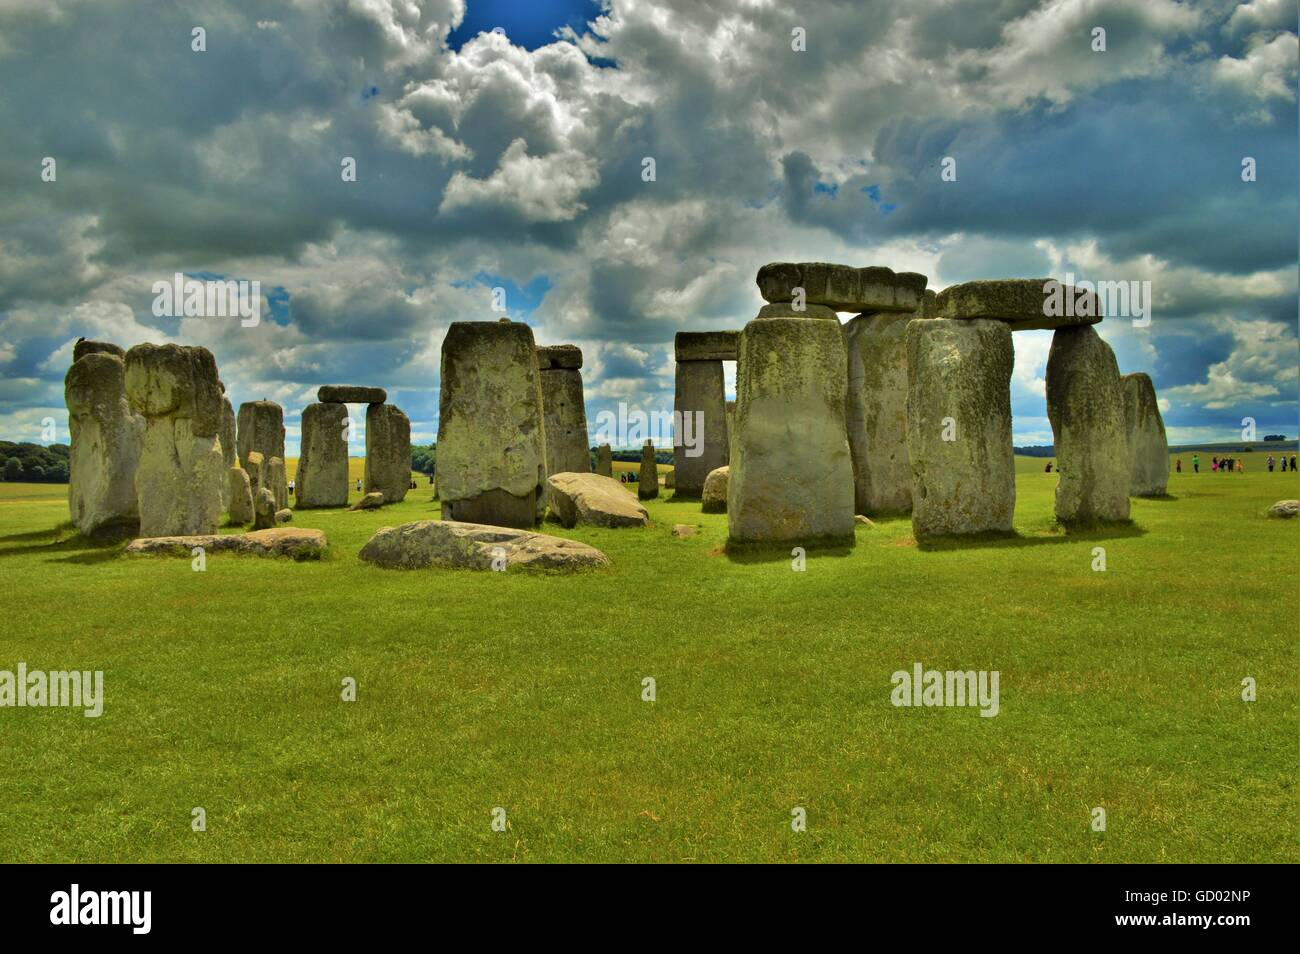 Stonehenge contre Nuages Photo Stock